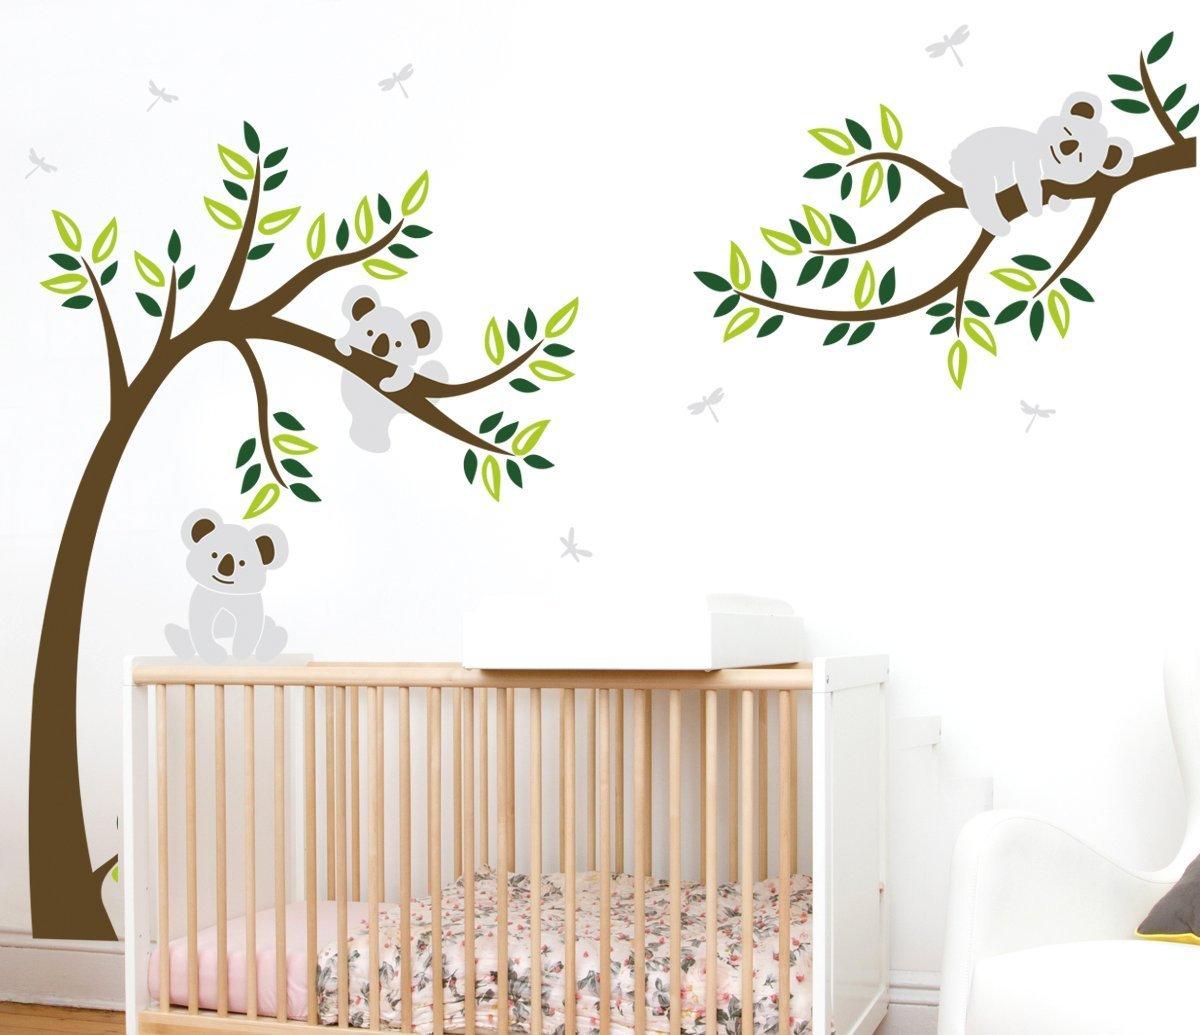 ALiQing Nursery Wall Decals~Family Tree Wall Decal Koala Bear Wall Stickers  Kids Baby Bedroom Wall Decor (225cm Width x 150cm Height) (Brown,Green)